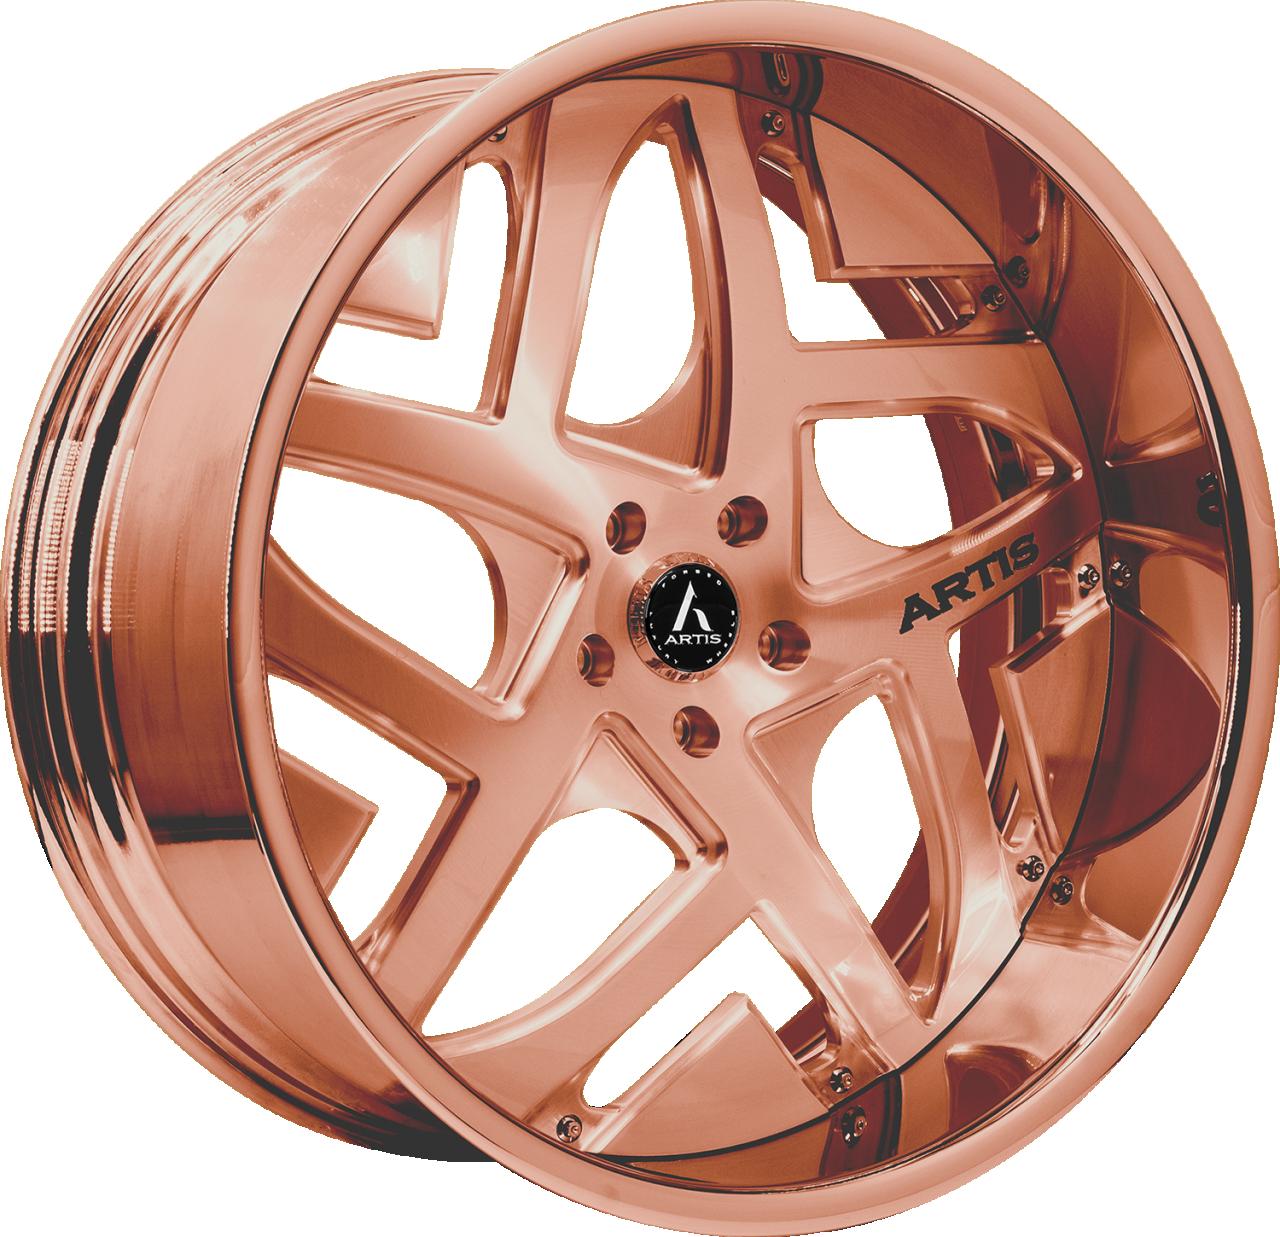 Artis Forged Pueblo wheel with Custom Rose Gold finish